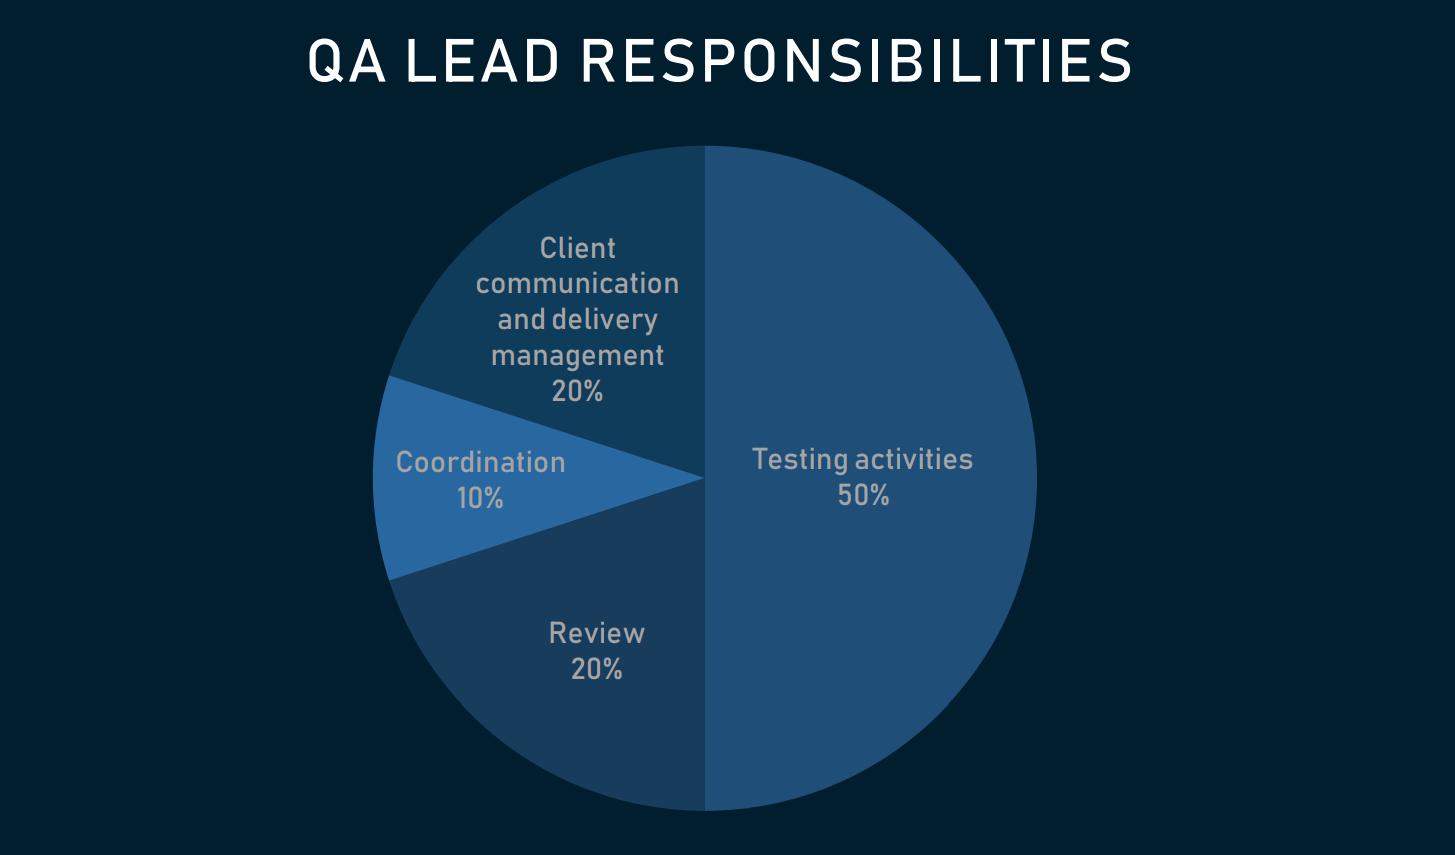 QA Lead Responsibilities